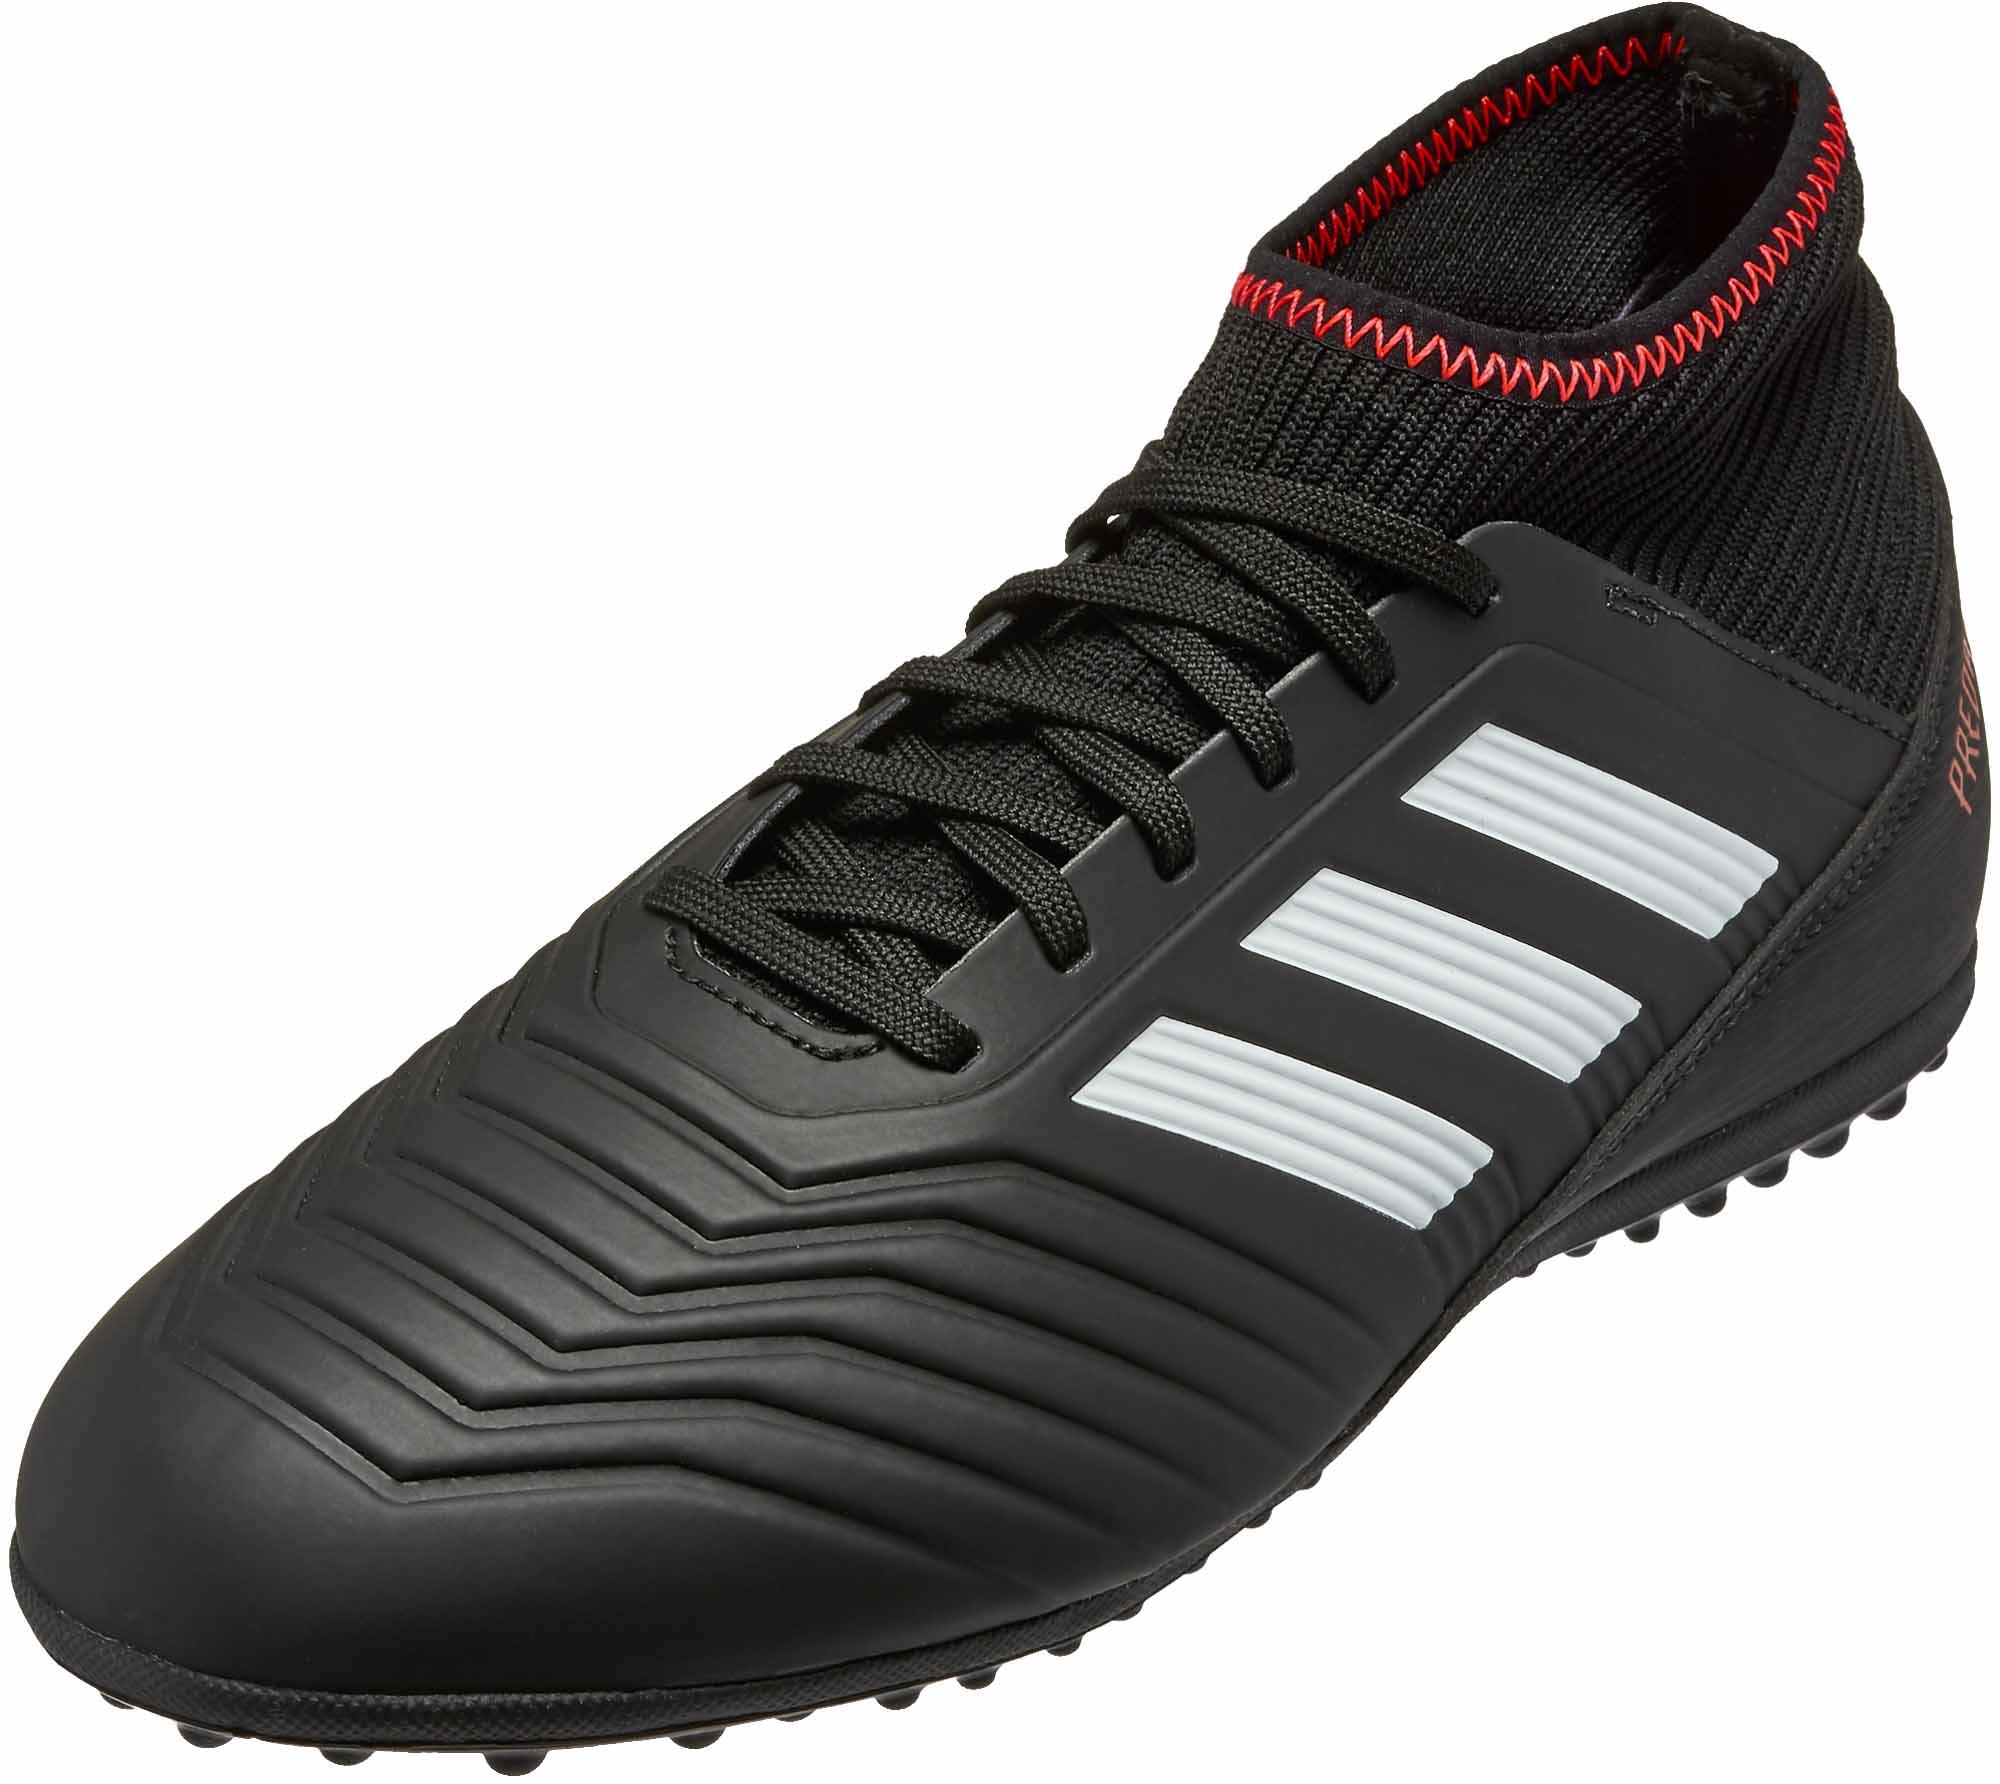 7a4173dd32173 adidas Kids Predator Tango 18.3 TF – Black/Solar Red